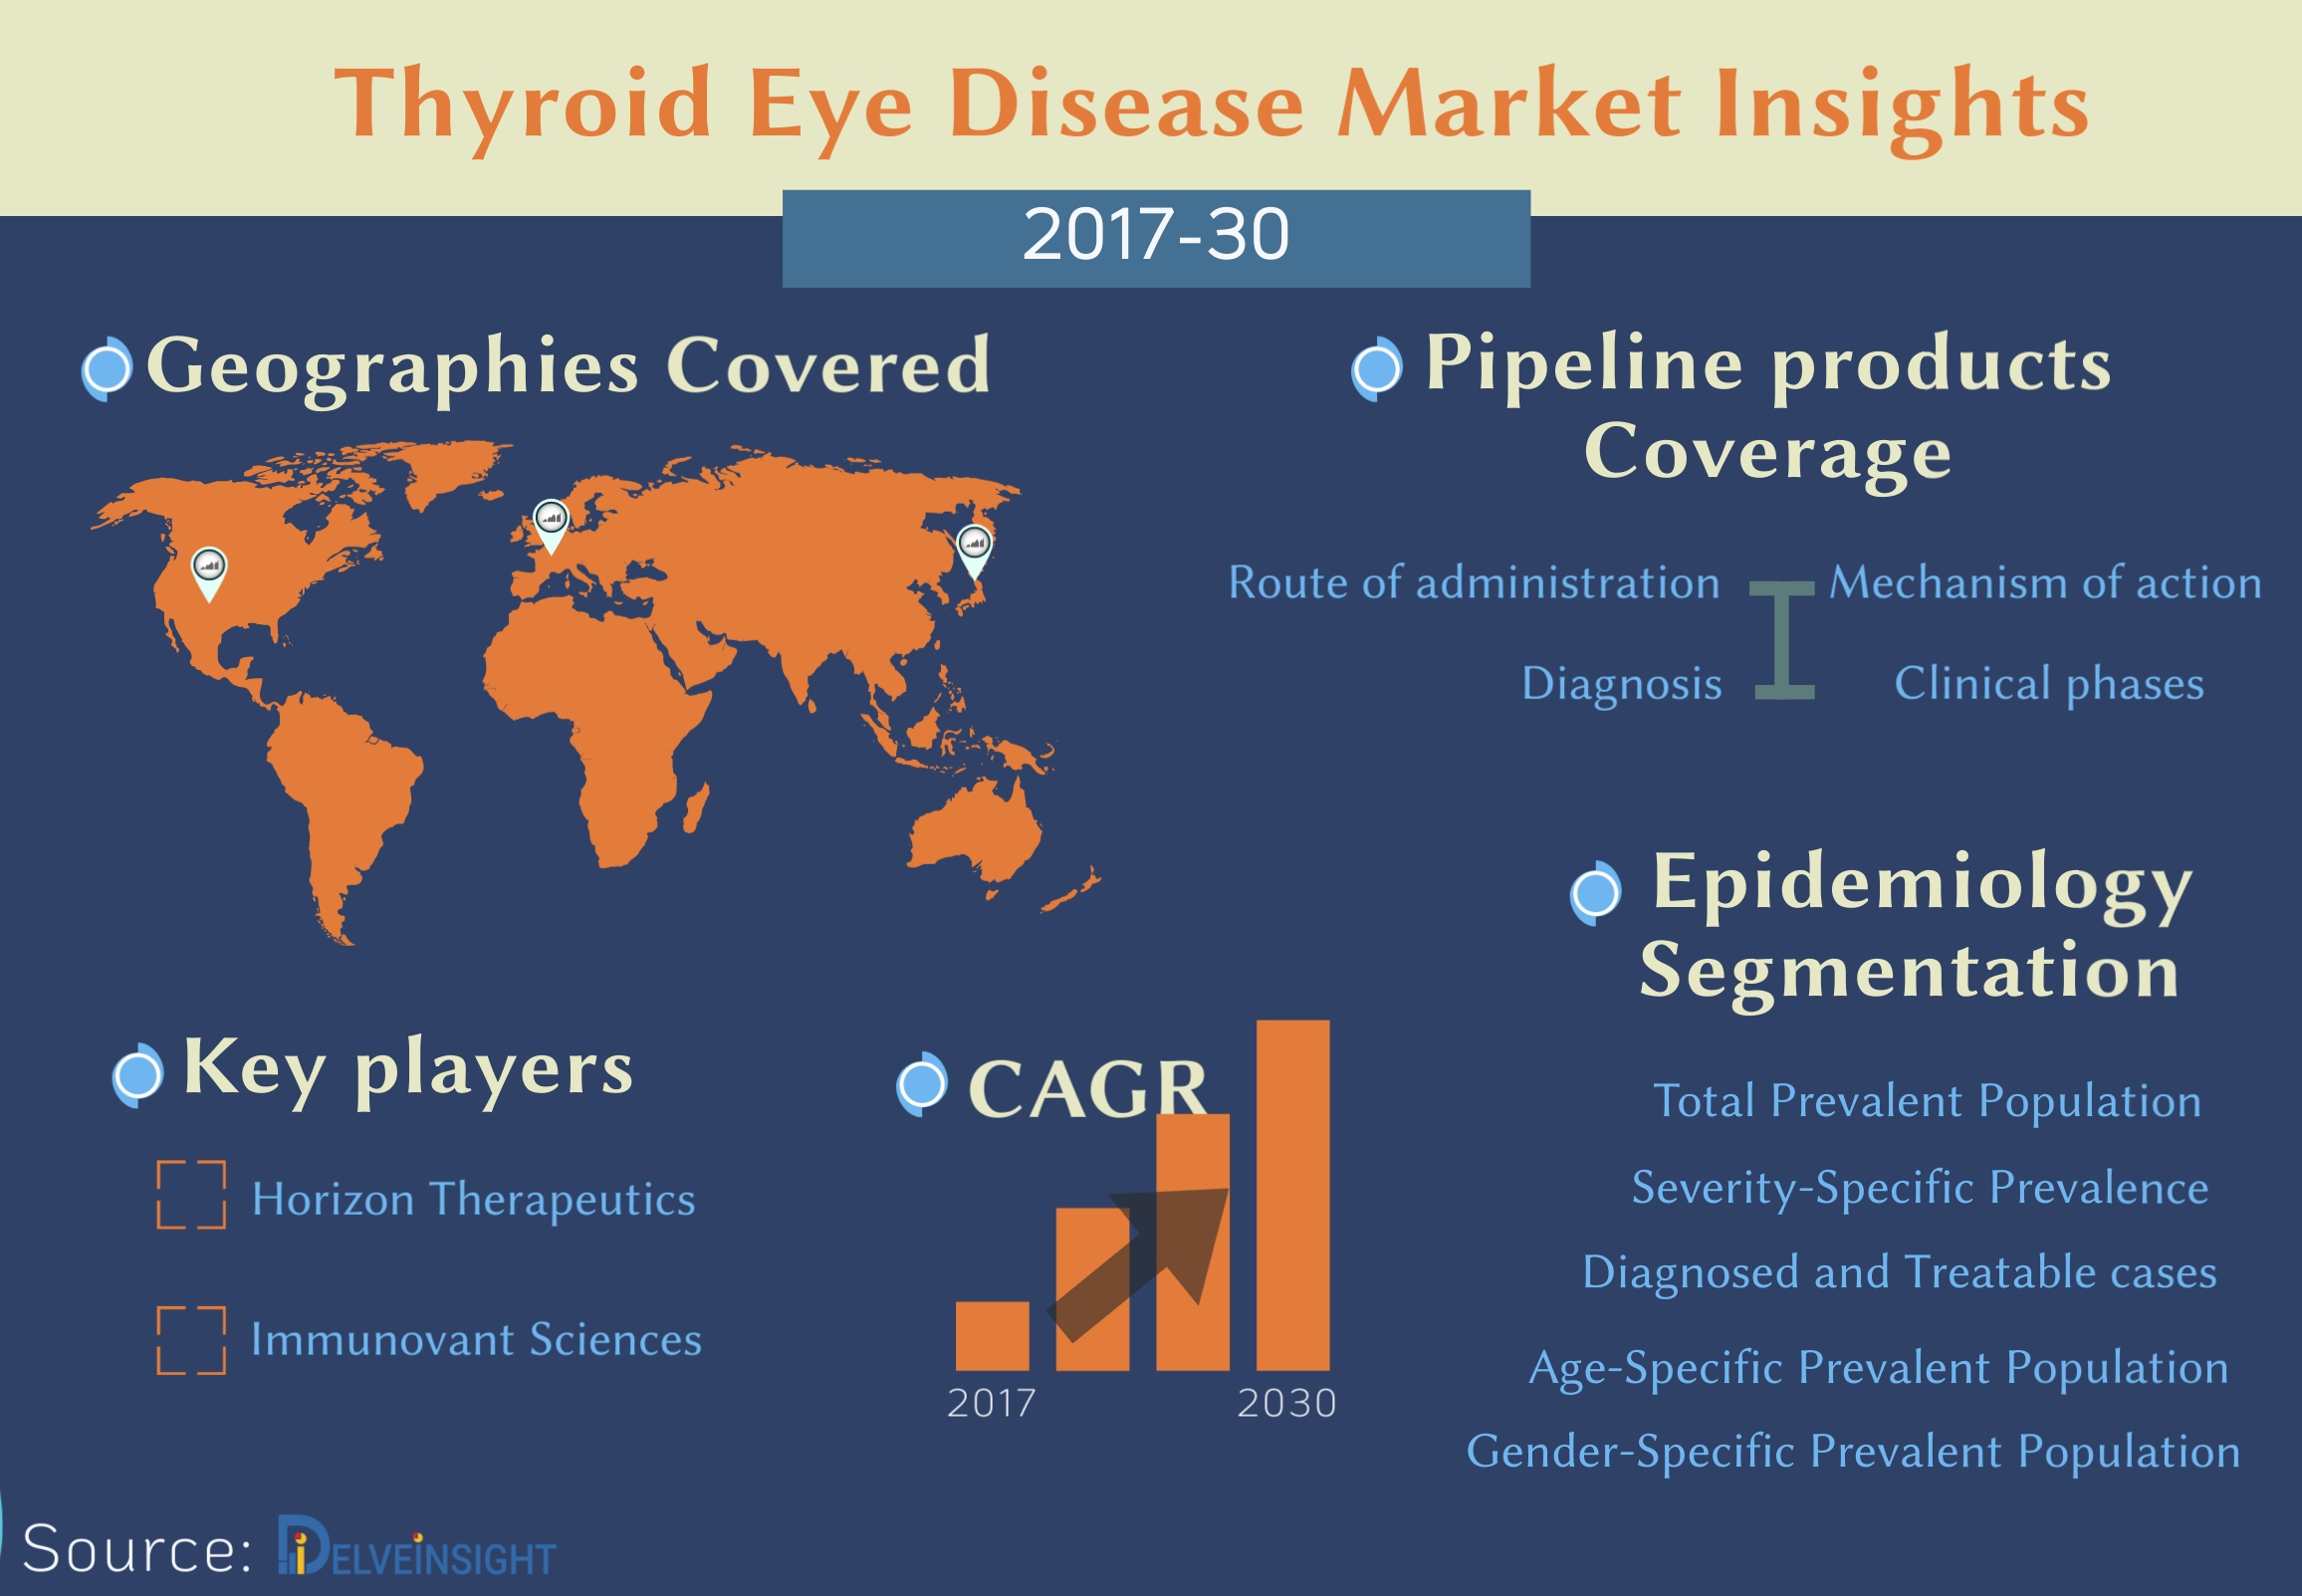 Thyroid Eye Disease Epidemiology: Historical and Forecasted analysis